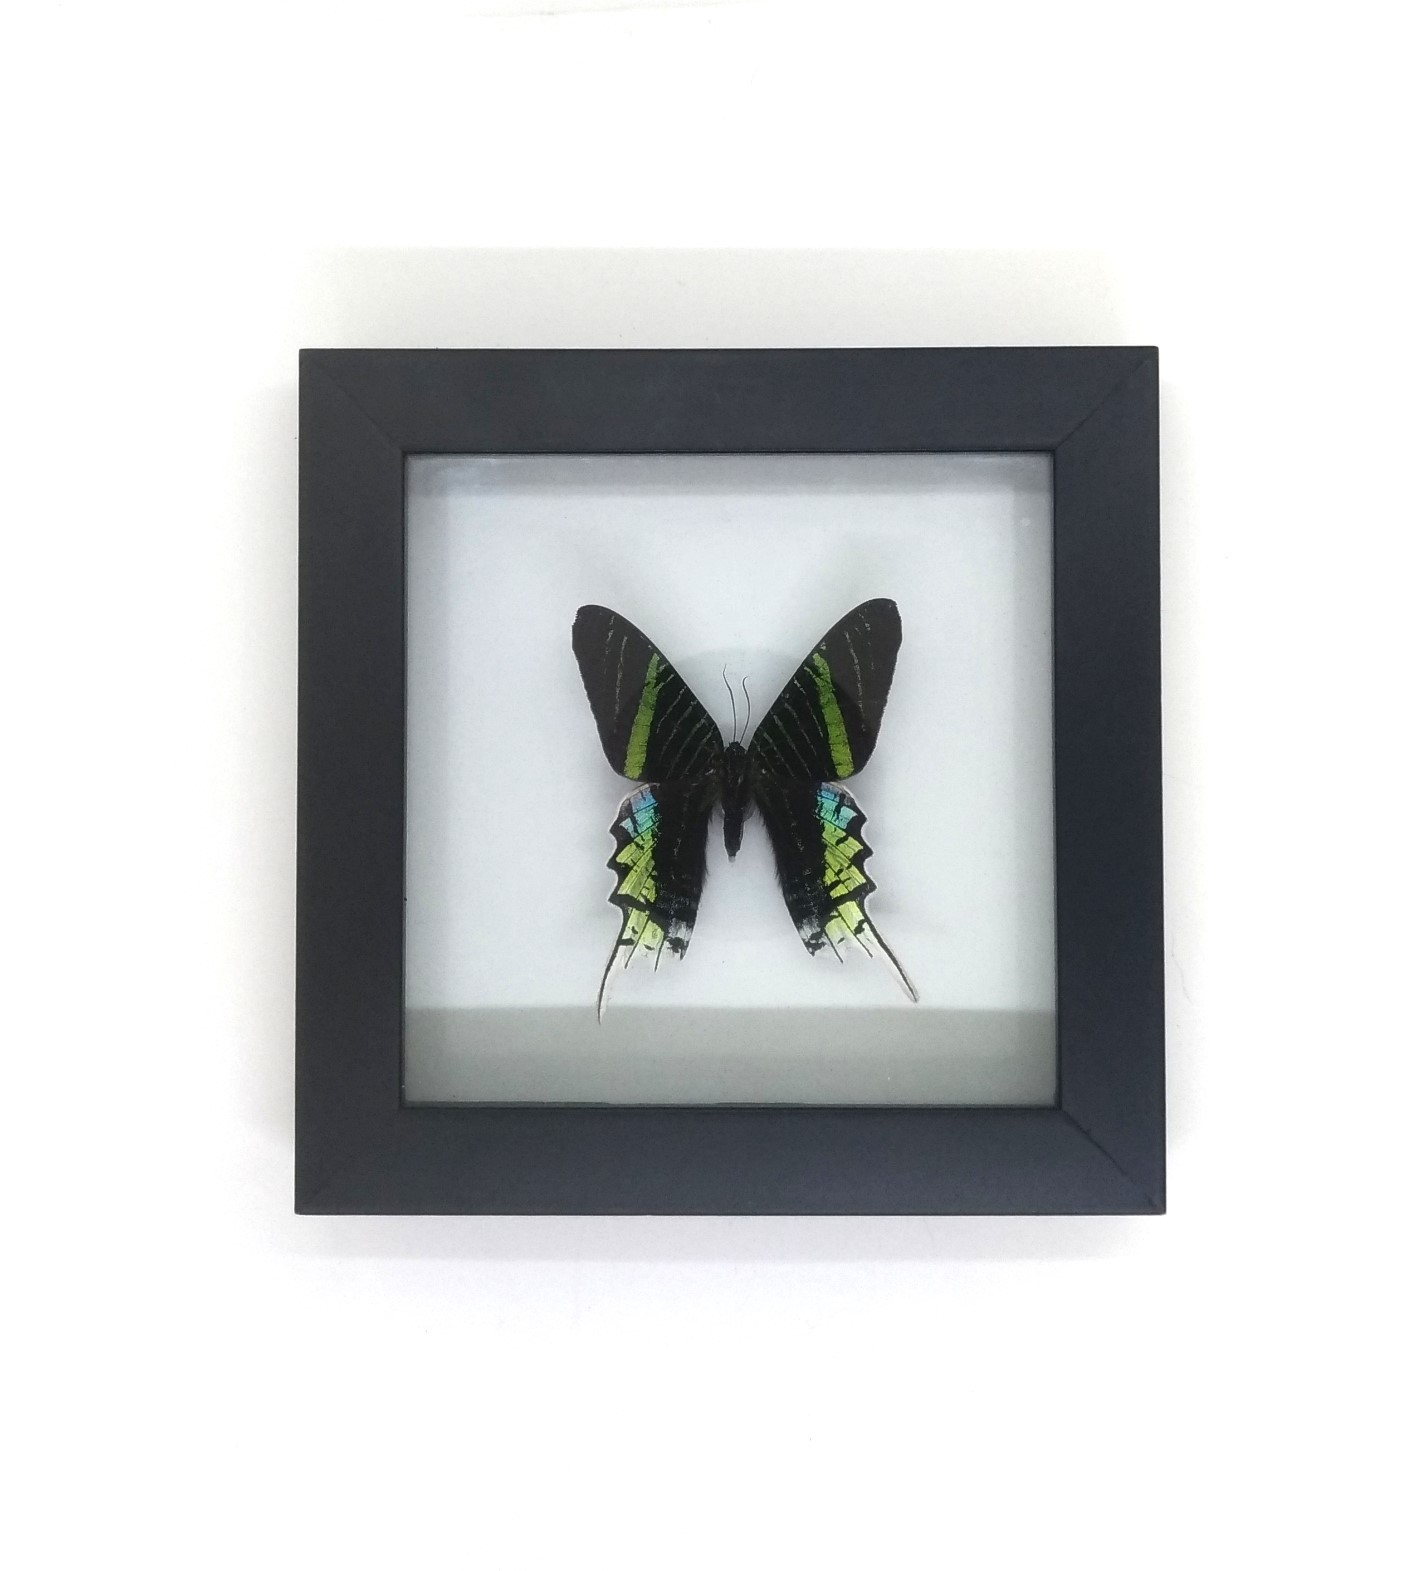 Cuadro Decorativo Mariposa Disecada Natural Zoocriadero Taxidermia